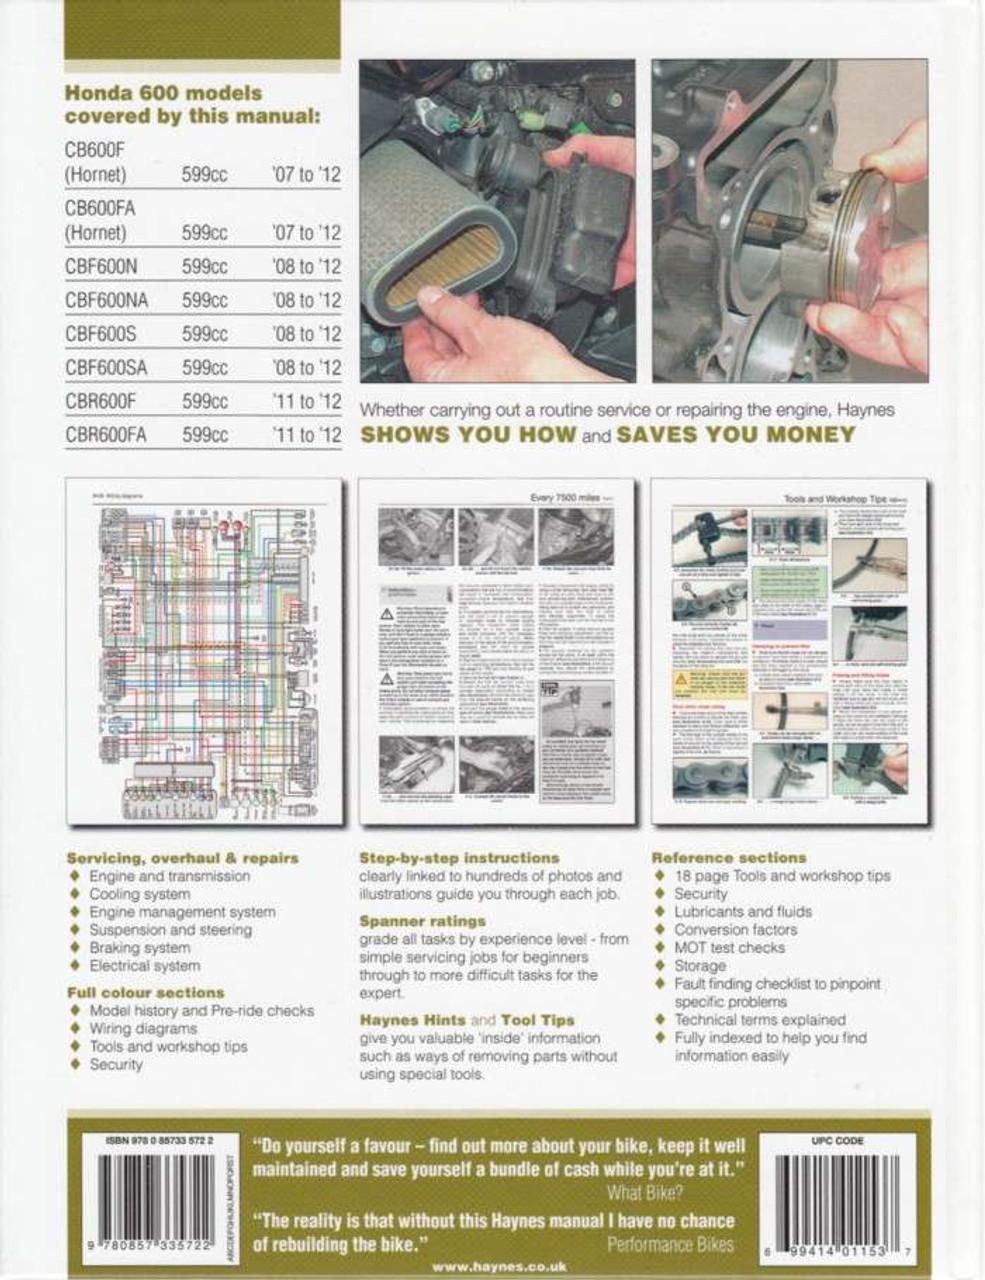 Enjoyable Honda Cb600F Hornet Cbf600 Cbr600F 2007 2012 Workshop Manual Wiring 101 Cranwise Assnl